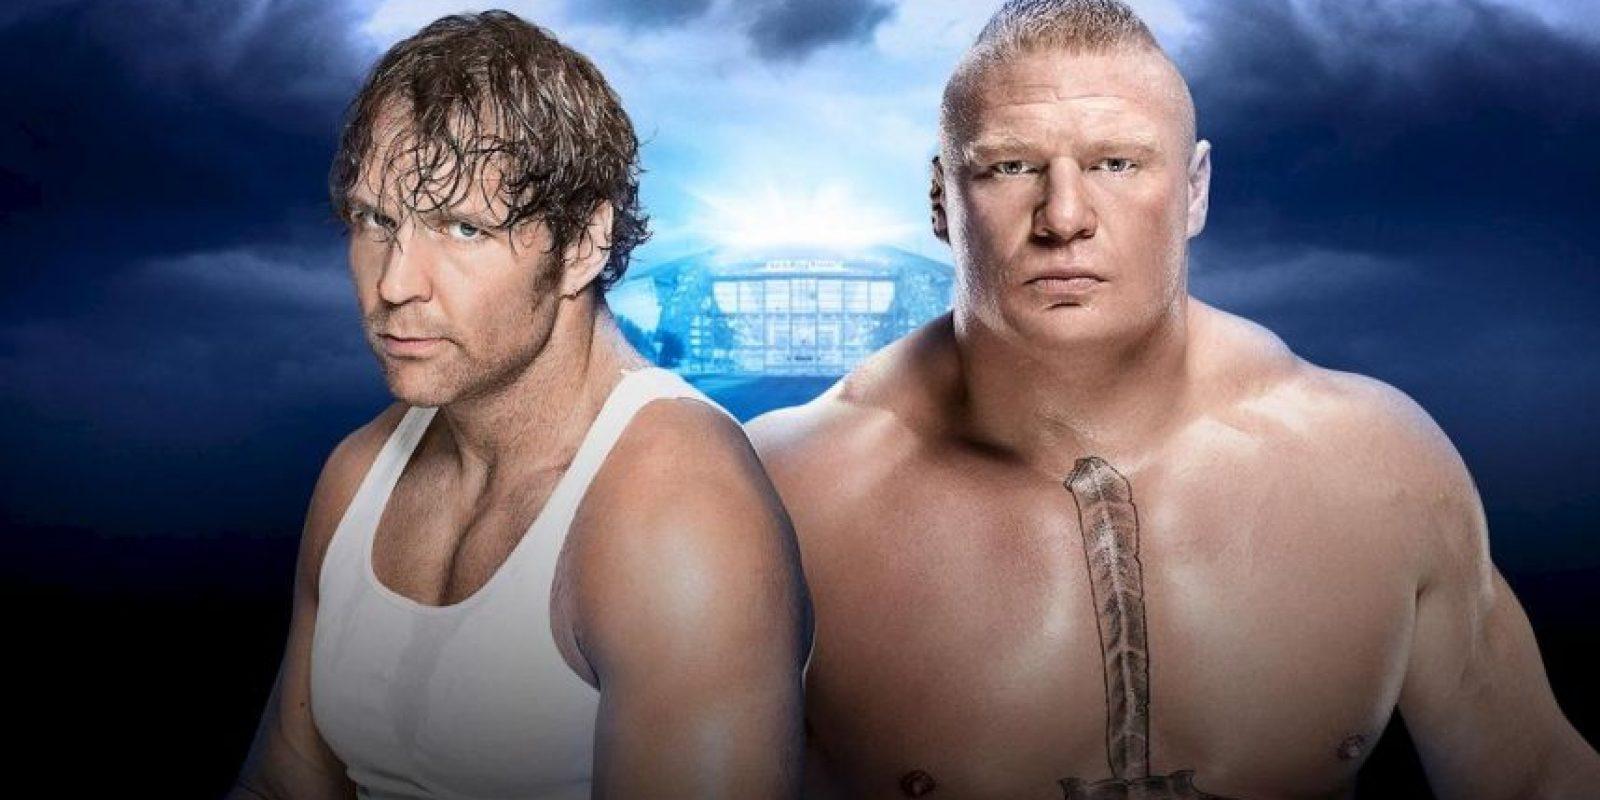 No Holds Barred Street Fight: Dean Ambrose vs. Brock Lesnar Foto:WWE